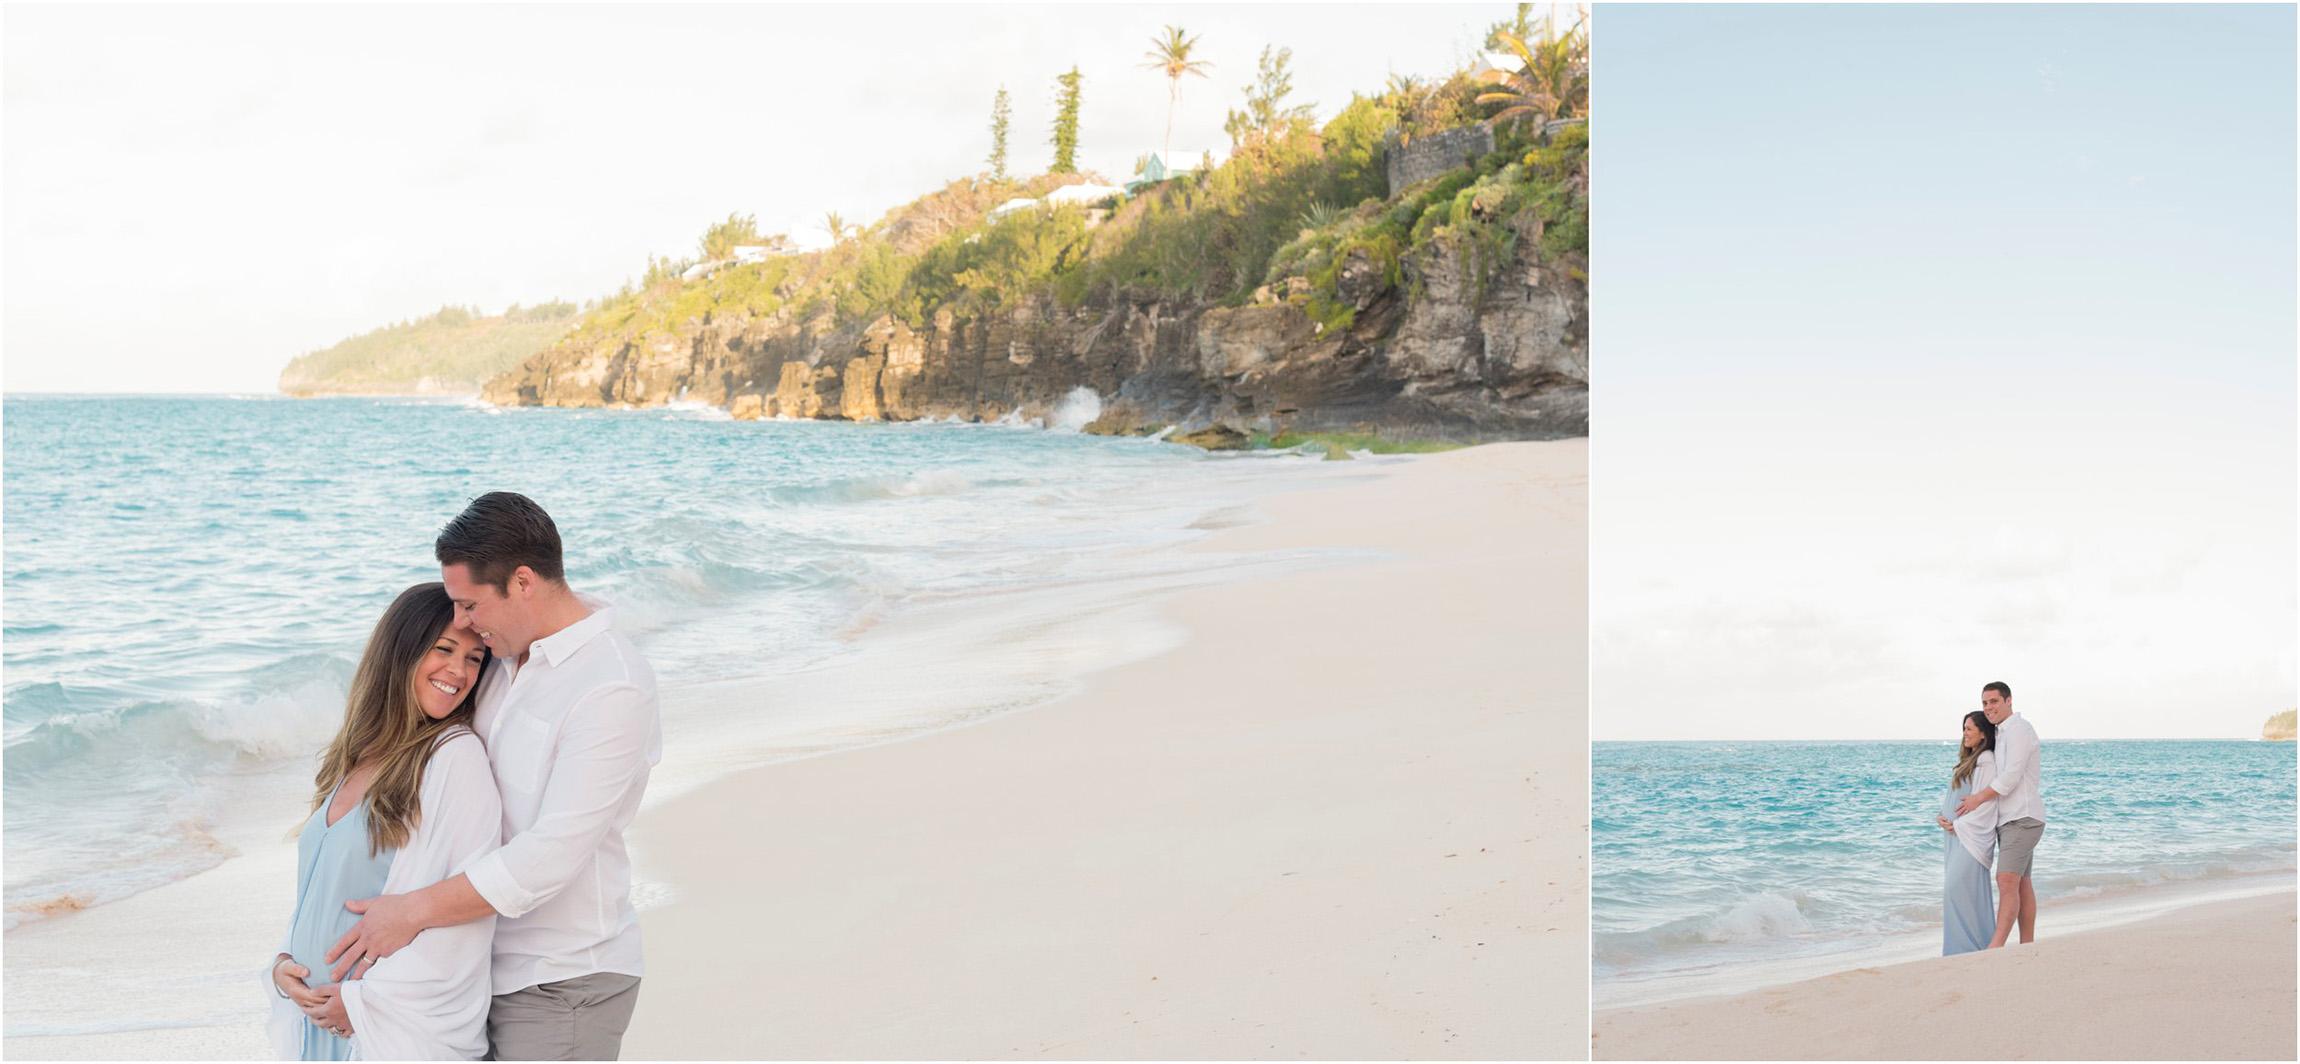 ©FianderFoto_Bermuda_Maternity_Photographer_The Reefs_Jaime__Eric_010.jpg